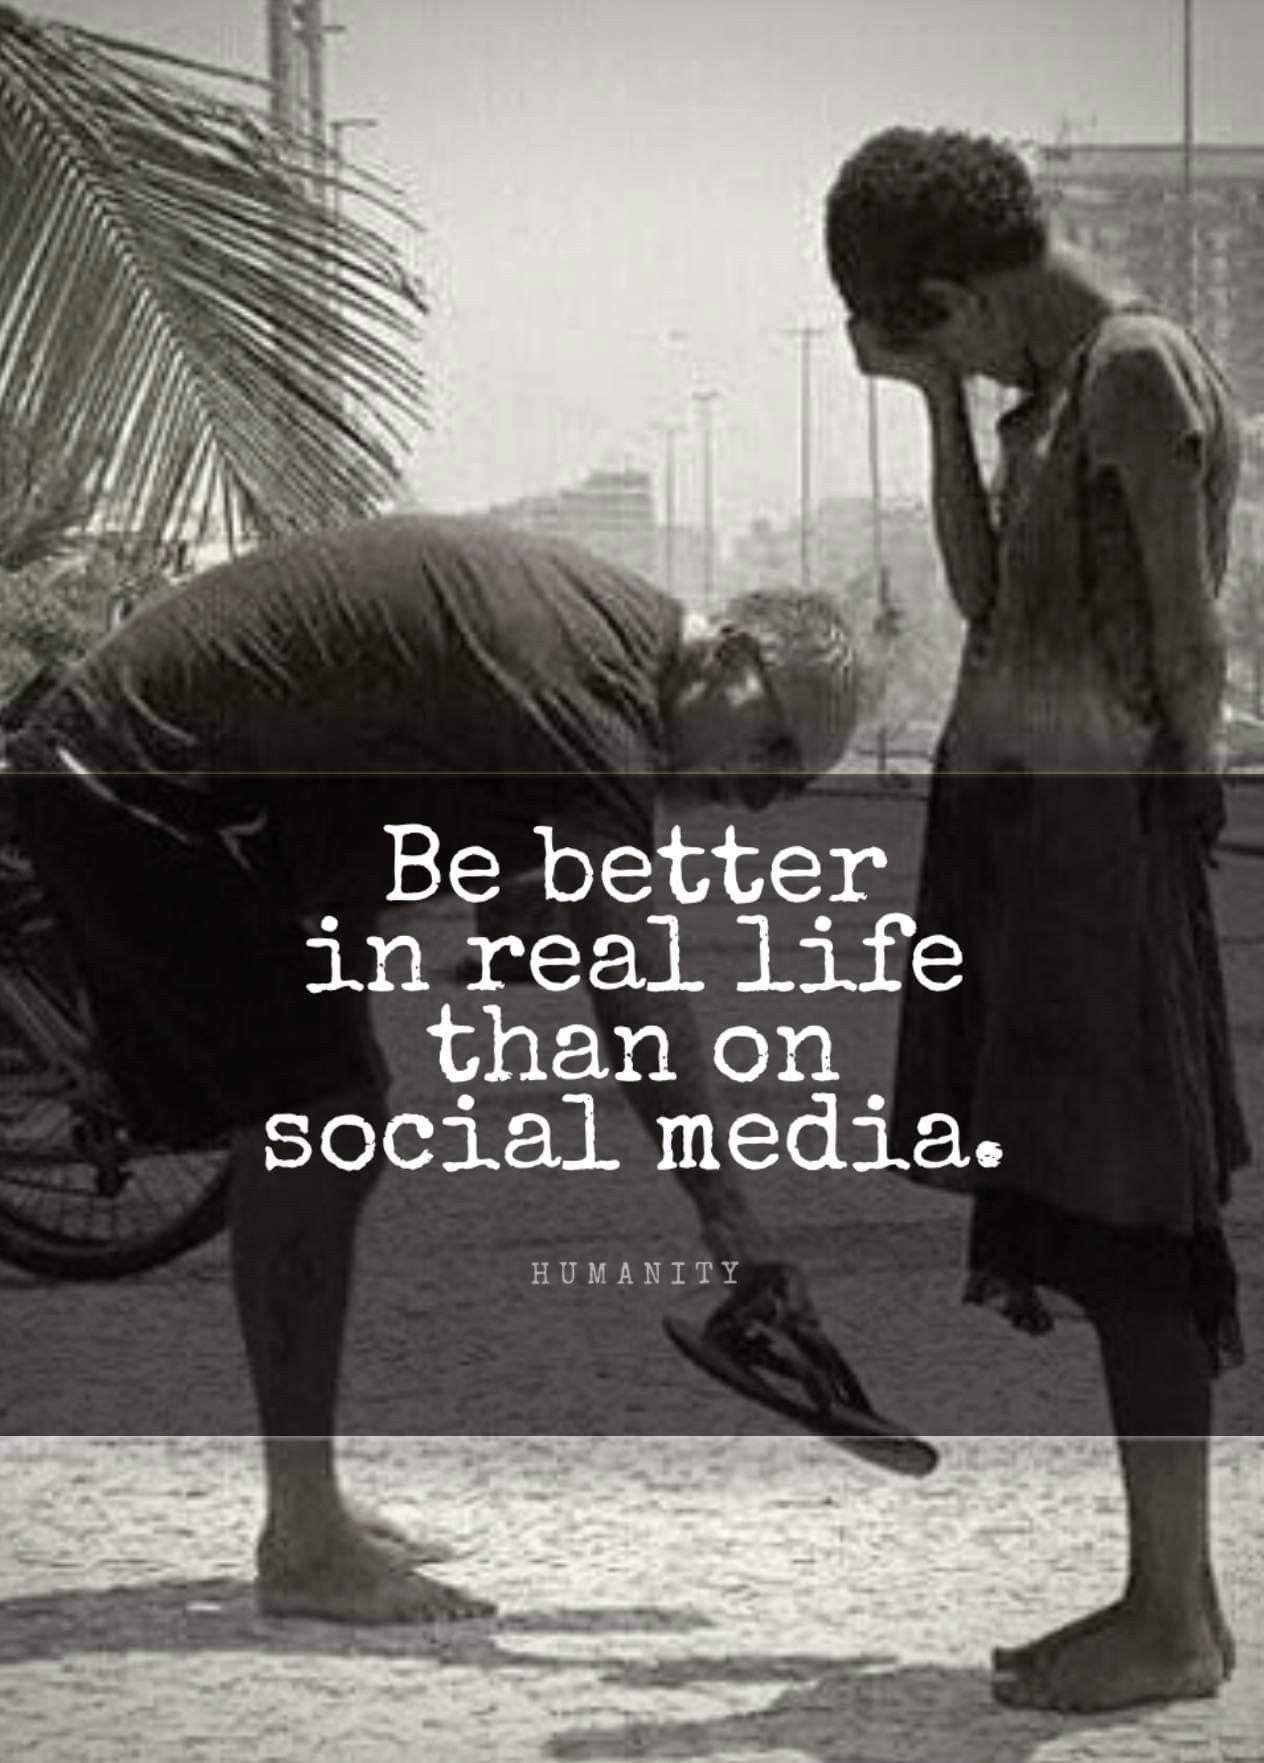 Pin By Aƈɬơɧơɩiƈ On Quotes Social Media Quotes Truths Inspirational Humor Funny Life Lessons